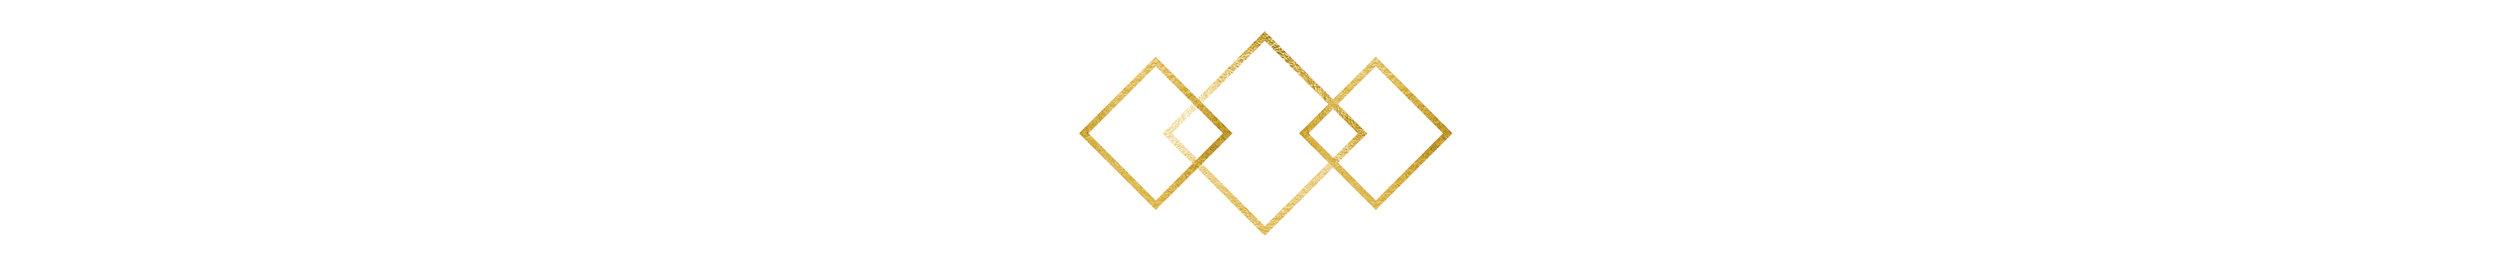 KMP-diamonds2.jpg